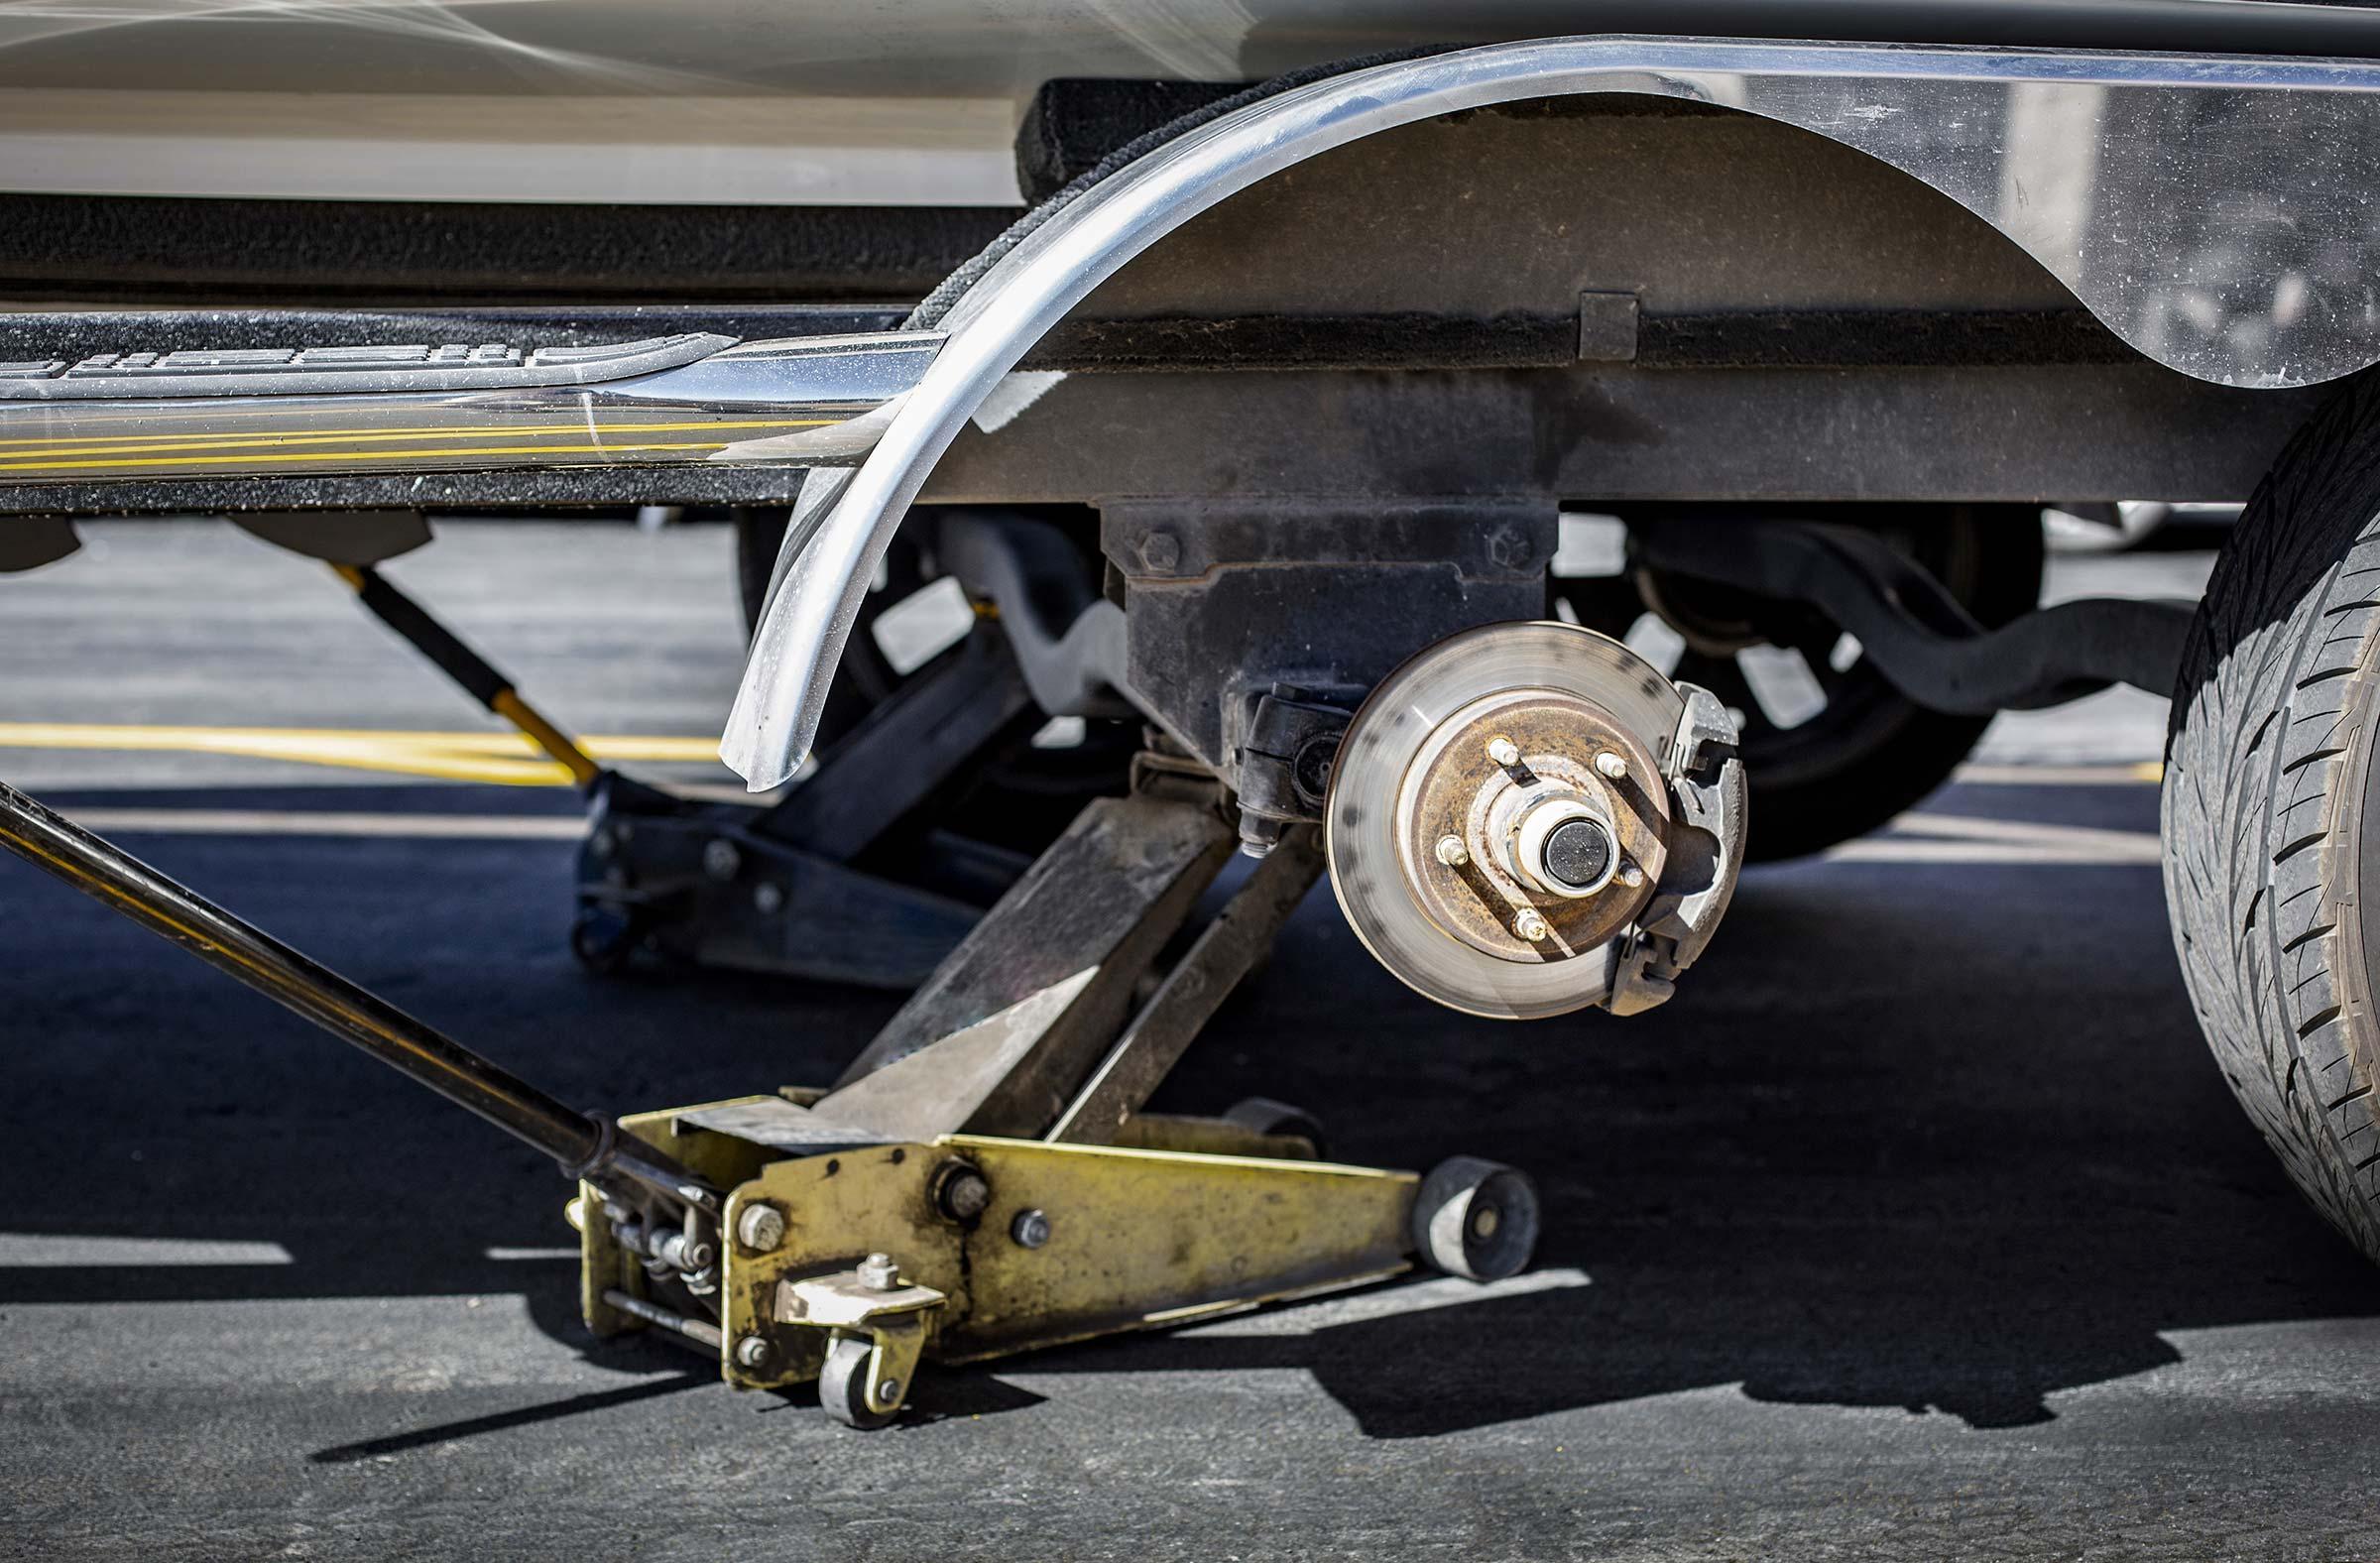 Trailer on jack with wheel hub exposed